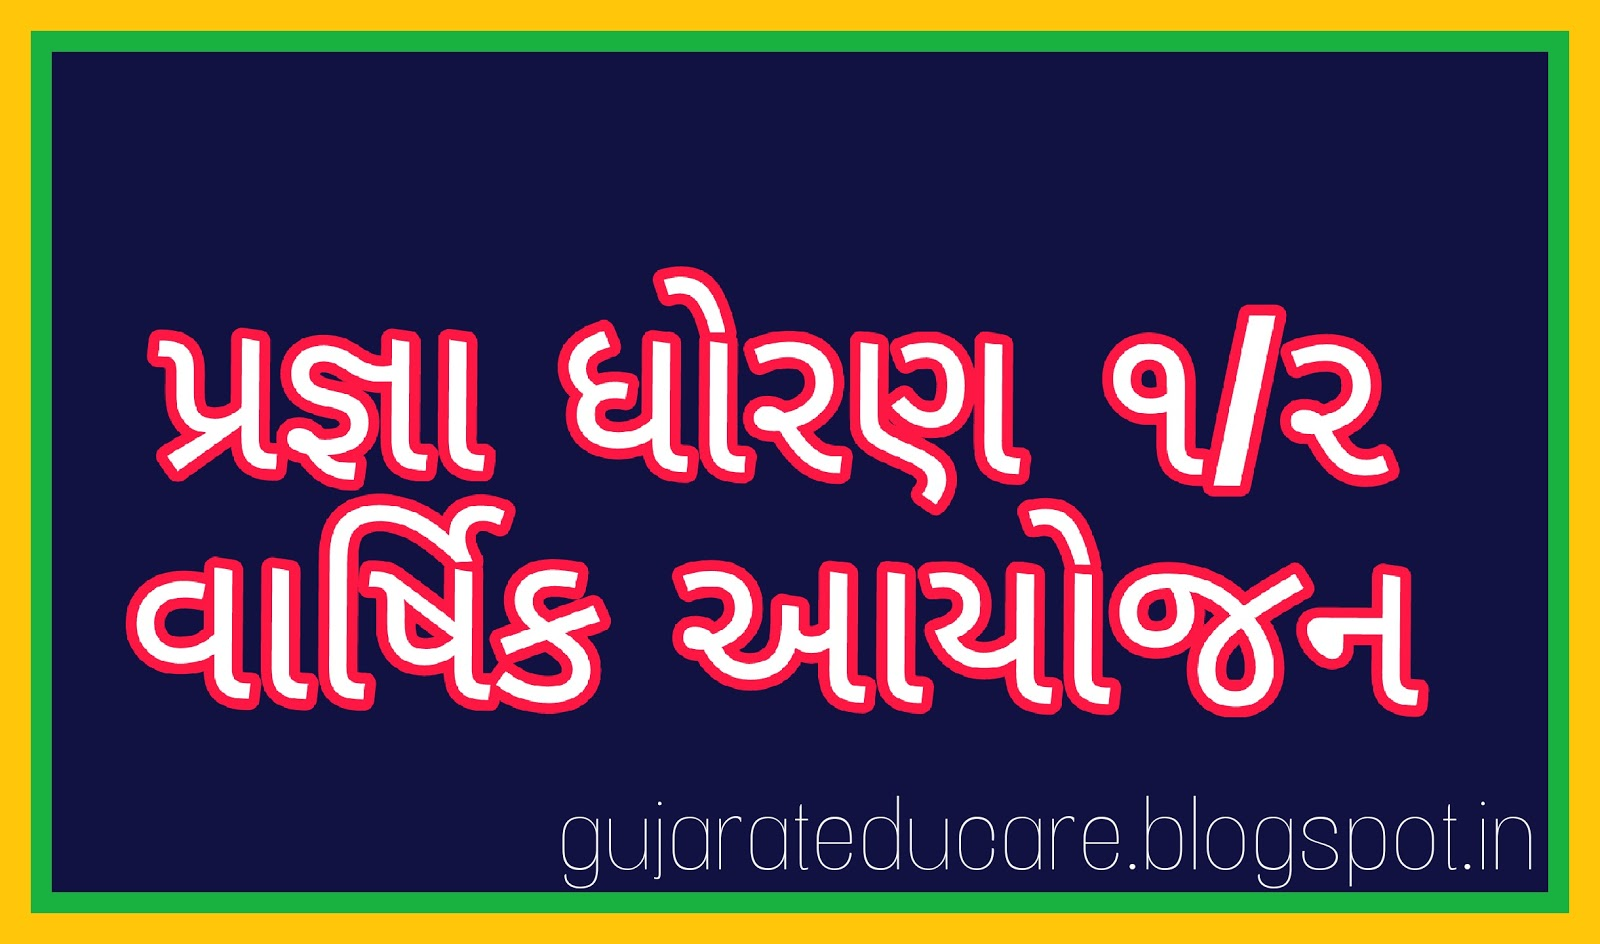 PRAGNA VARSHIK AAYOJAN FOR STANDARD - 1 & 2 - Gujarat Educare